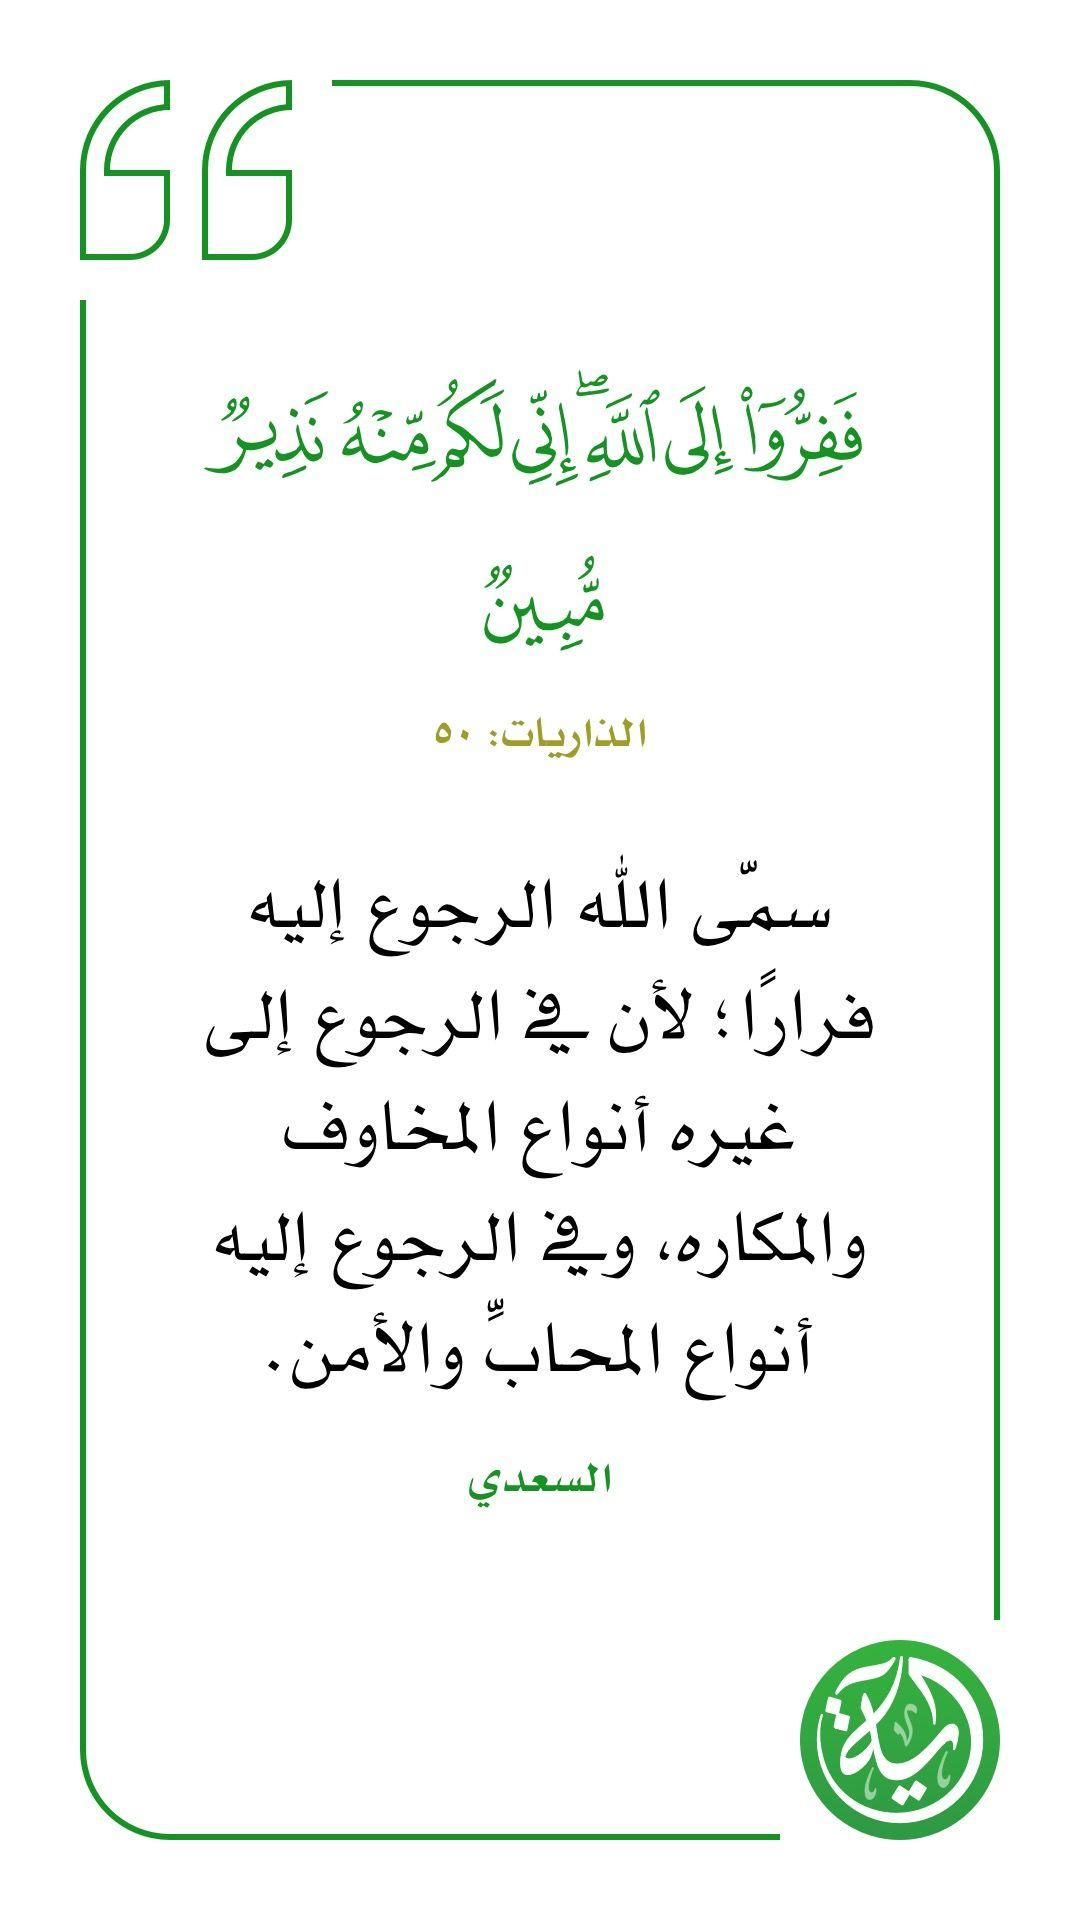 ف ف ر وا إ ل ى الل ه إ ن ي ل ك م م ن ه ن ذ ير م ب ين الذاريات 50 Quran Quotes Words Quotes Quran Quotes Love